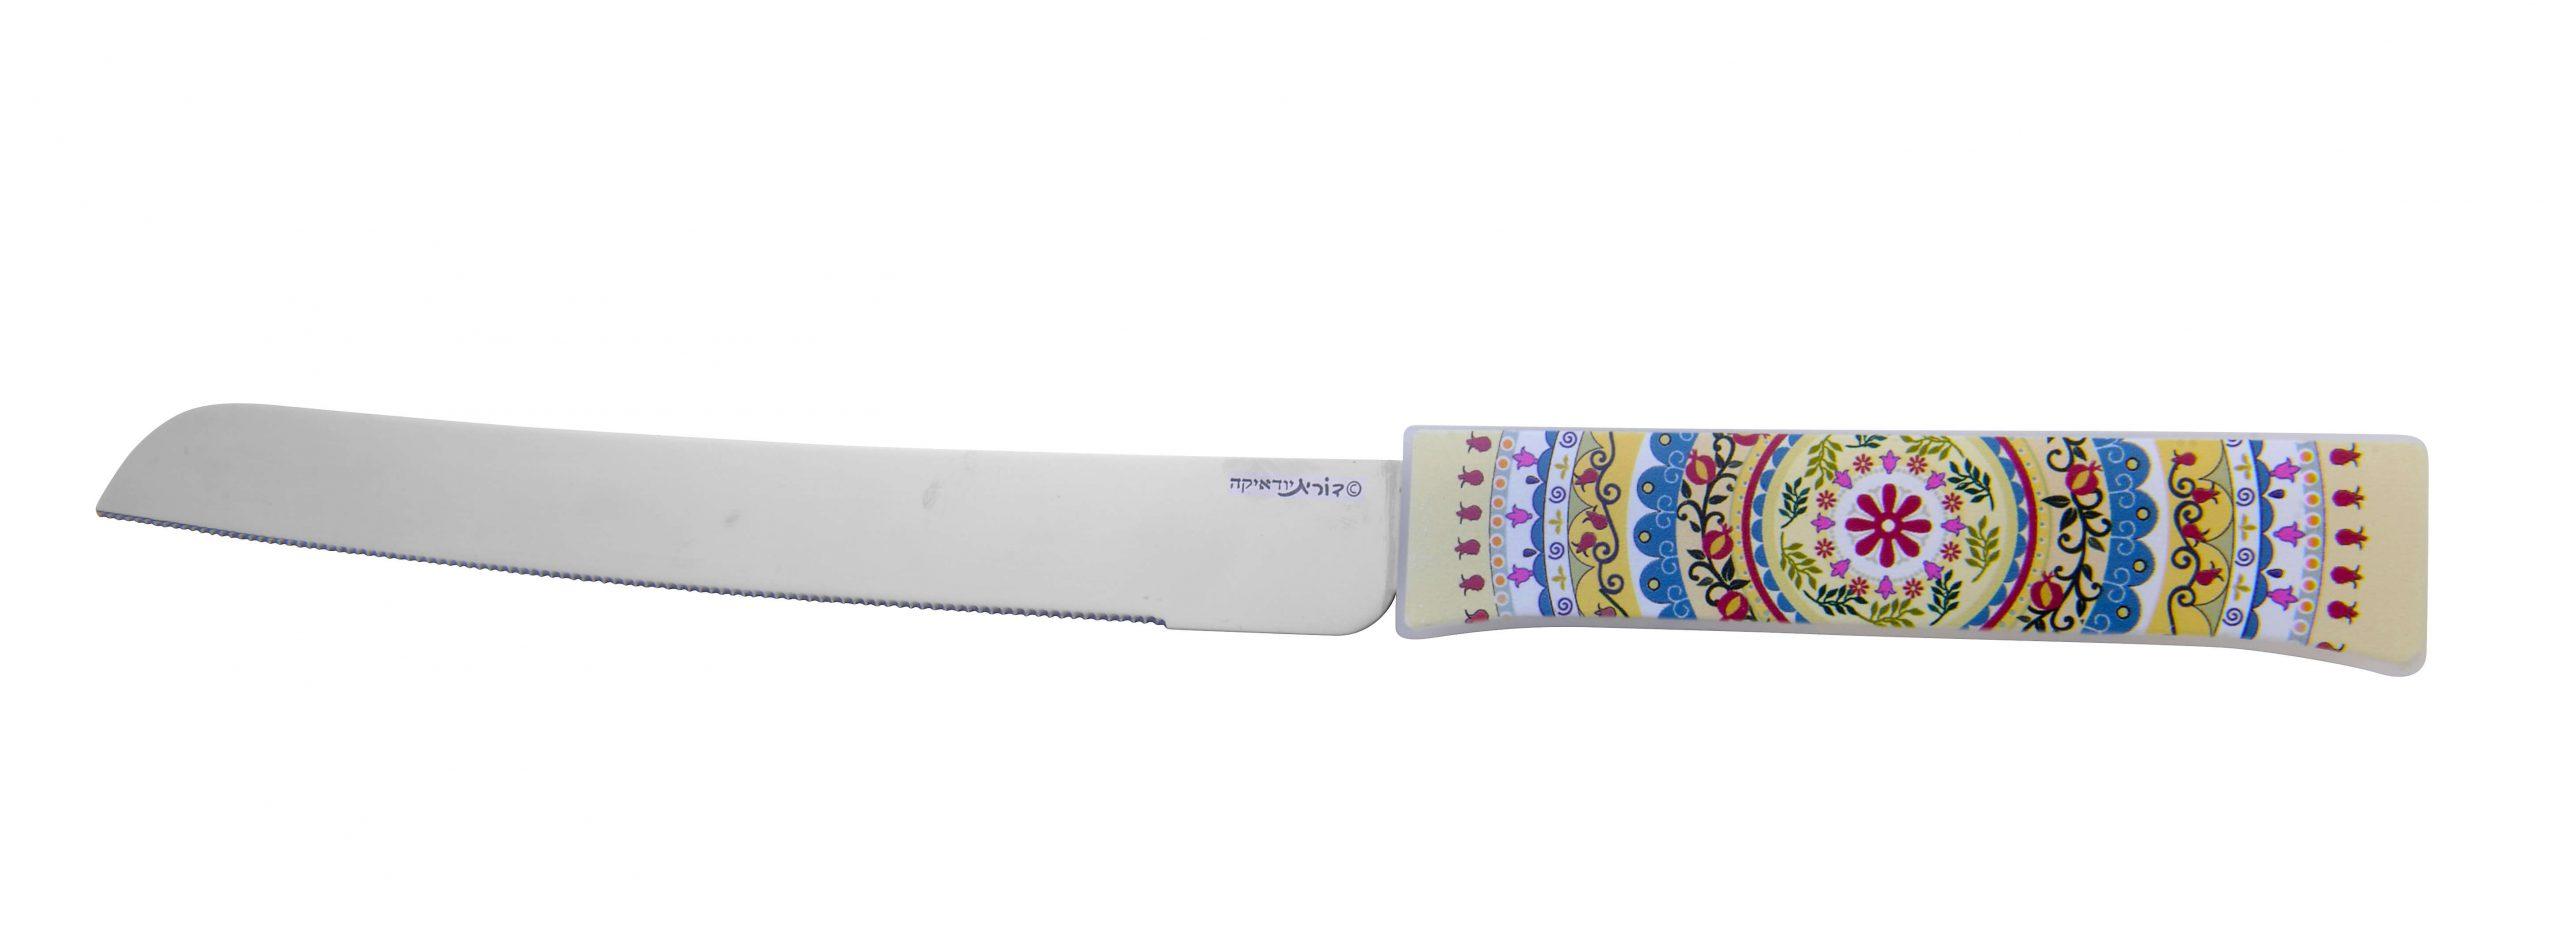 סכין חלה צבעוני